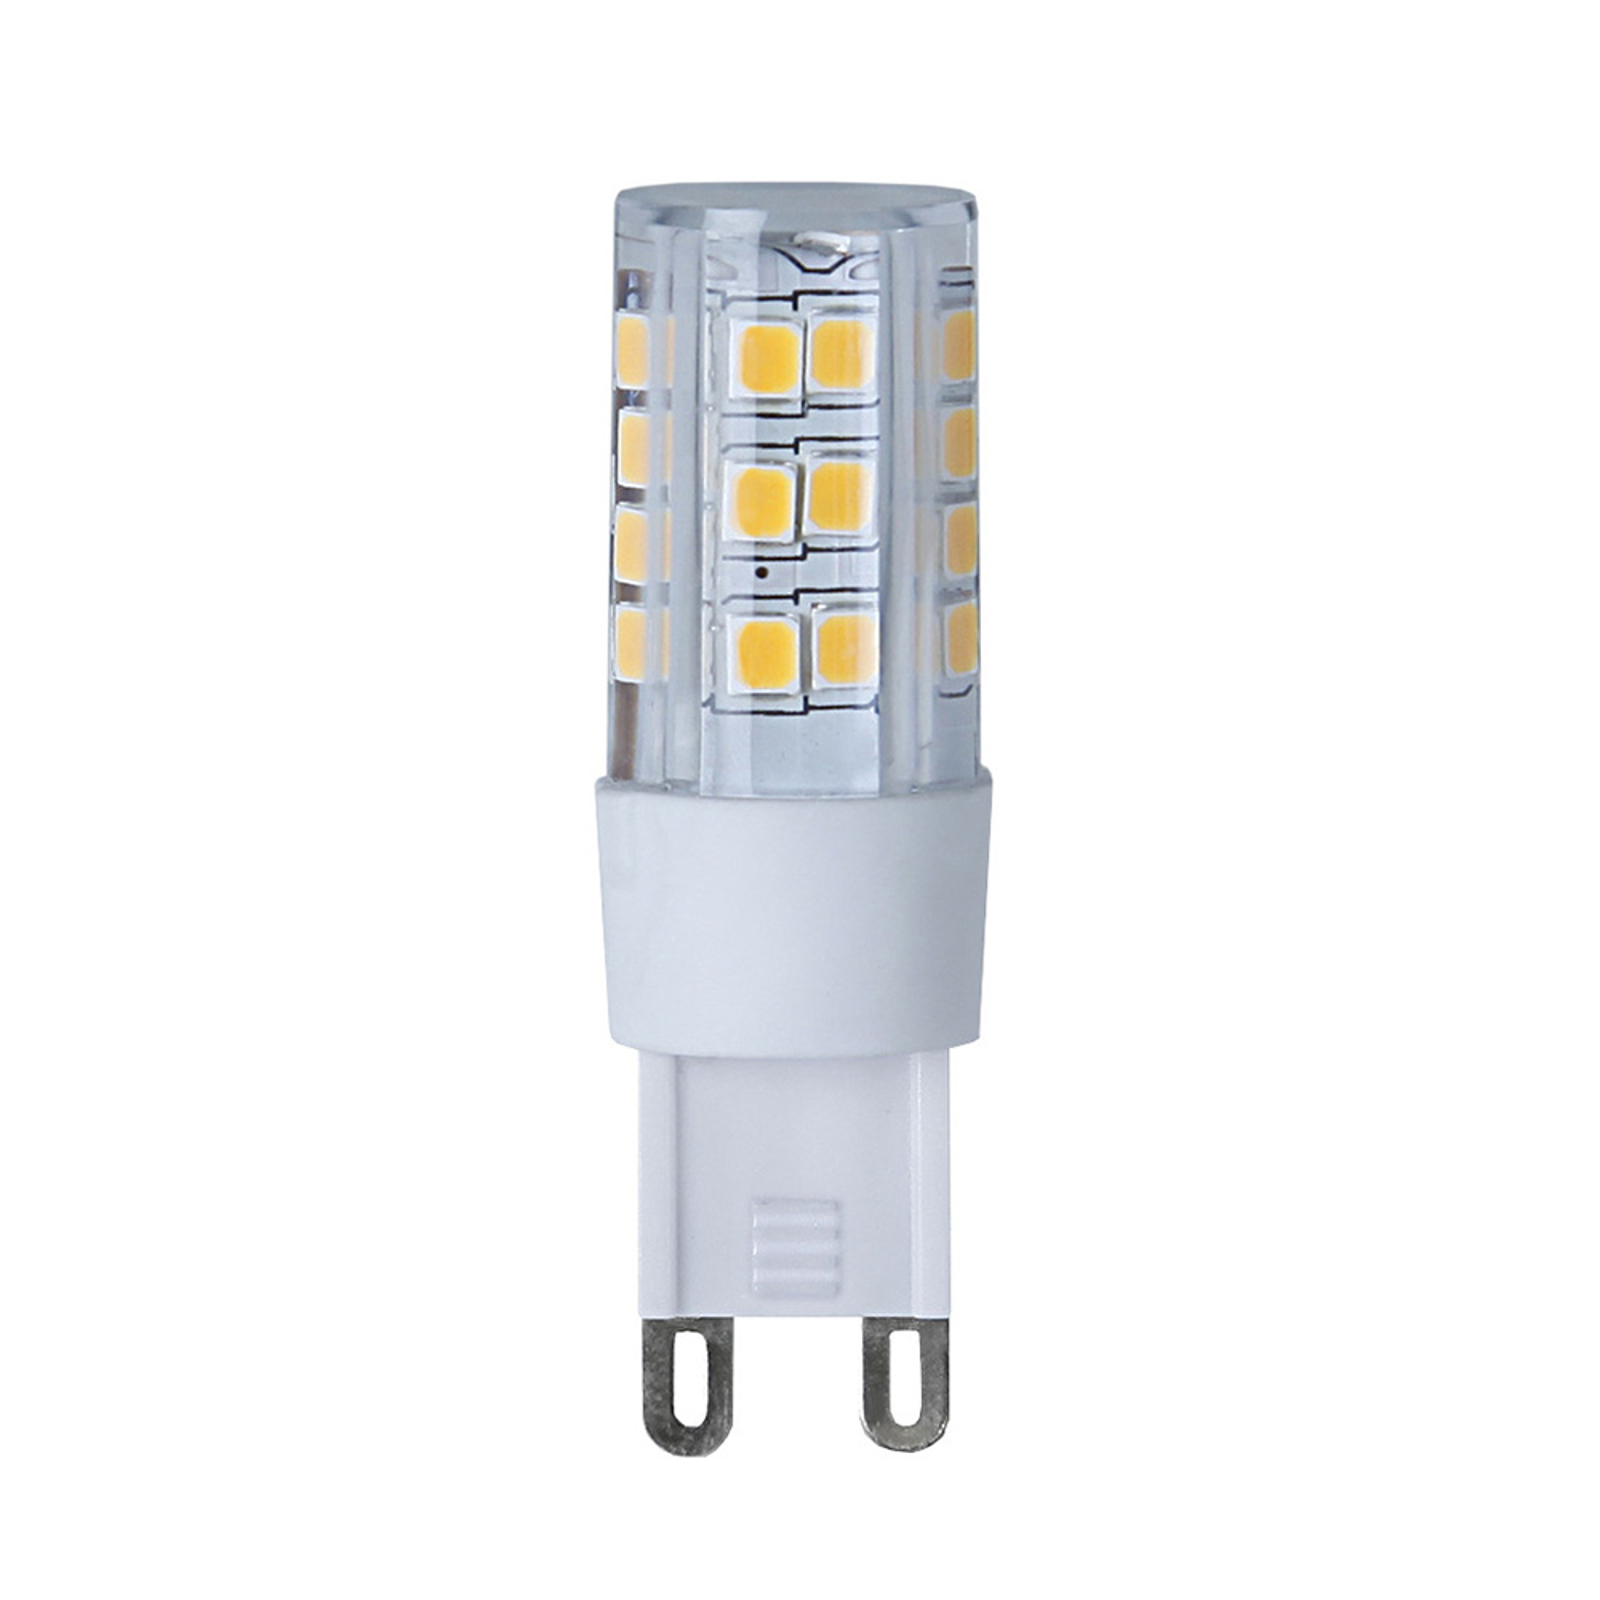 LED-stiftpære G9 3,8 W 4000 K